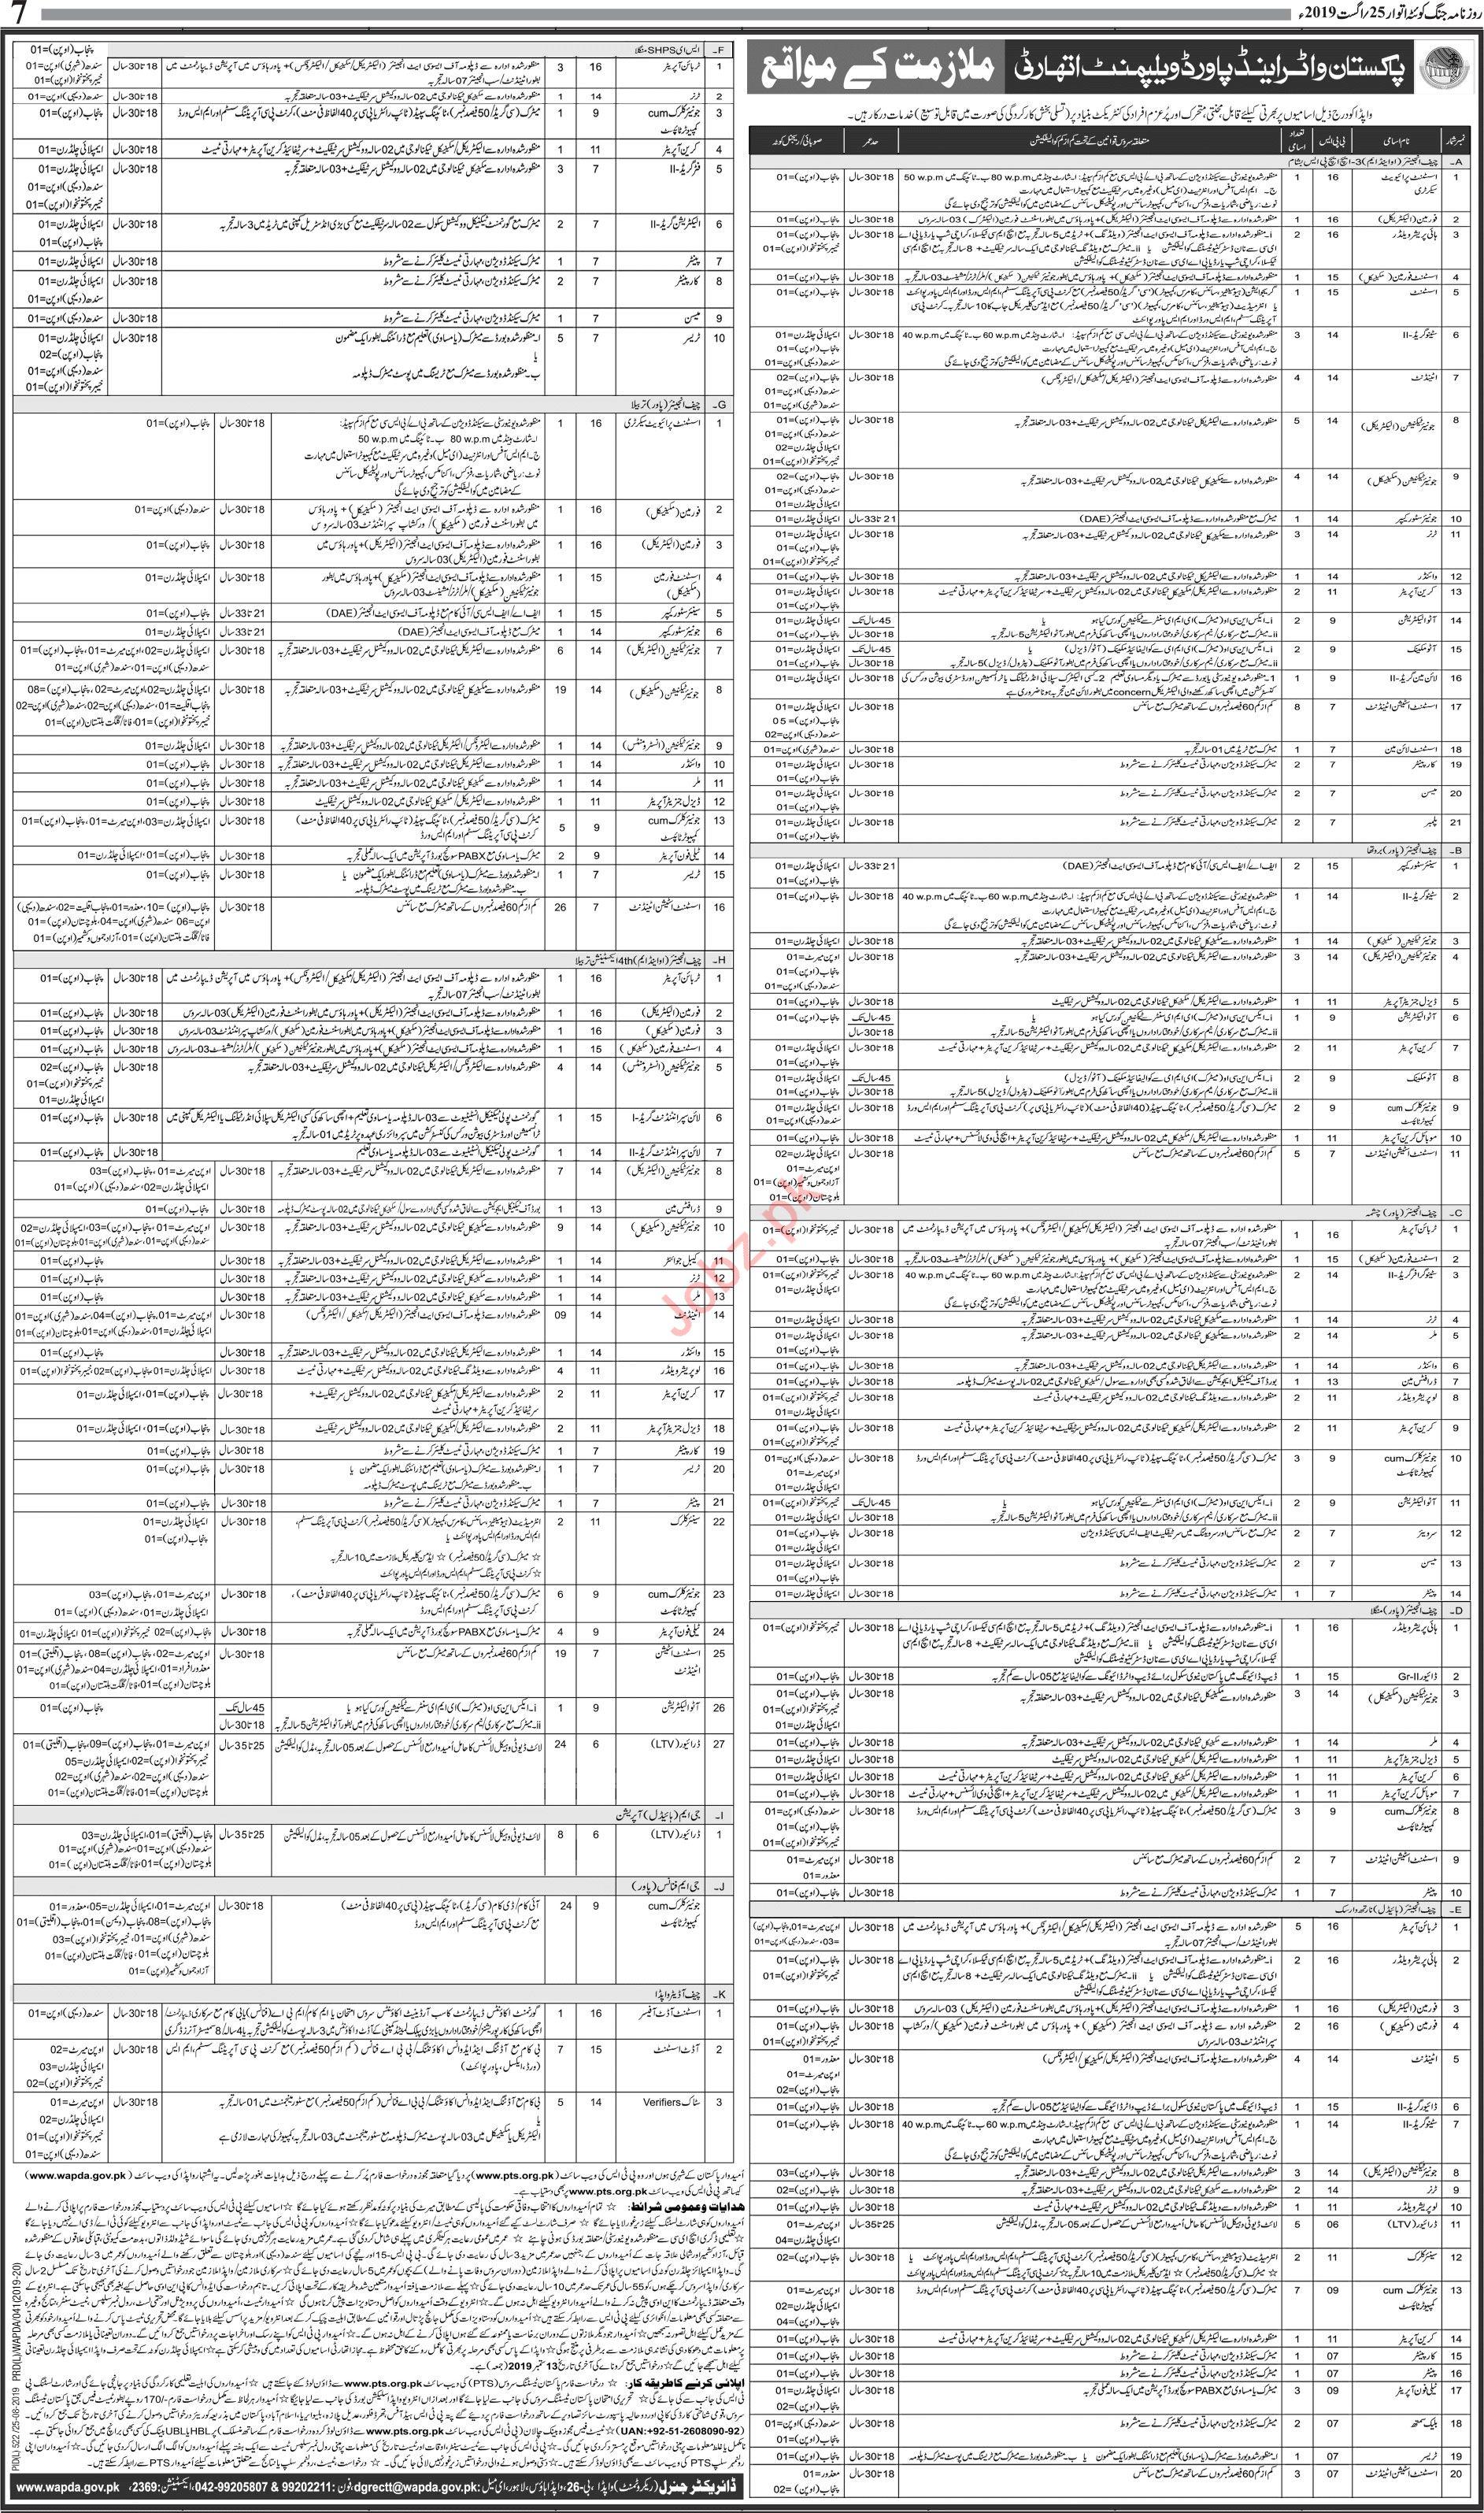 WAPDA Pakistan Water & Power Development Authority Jobs 2019